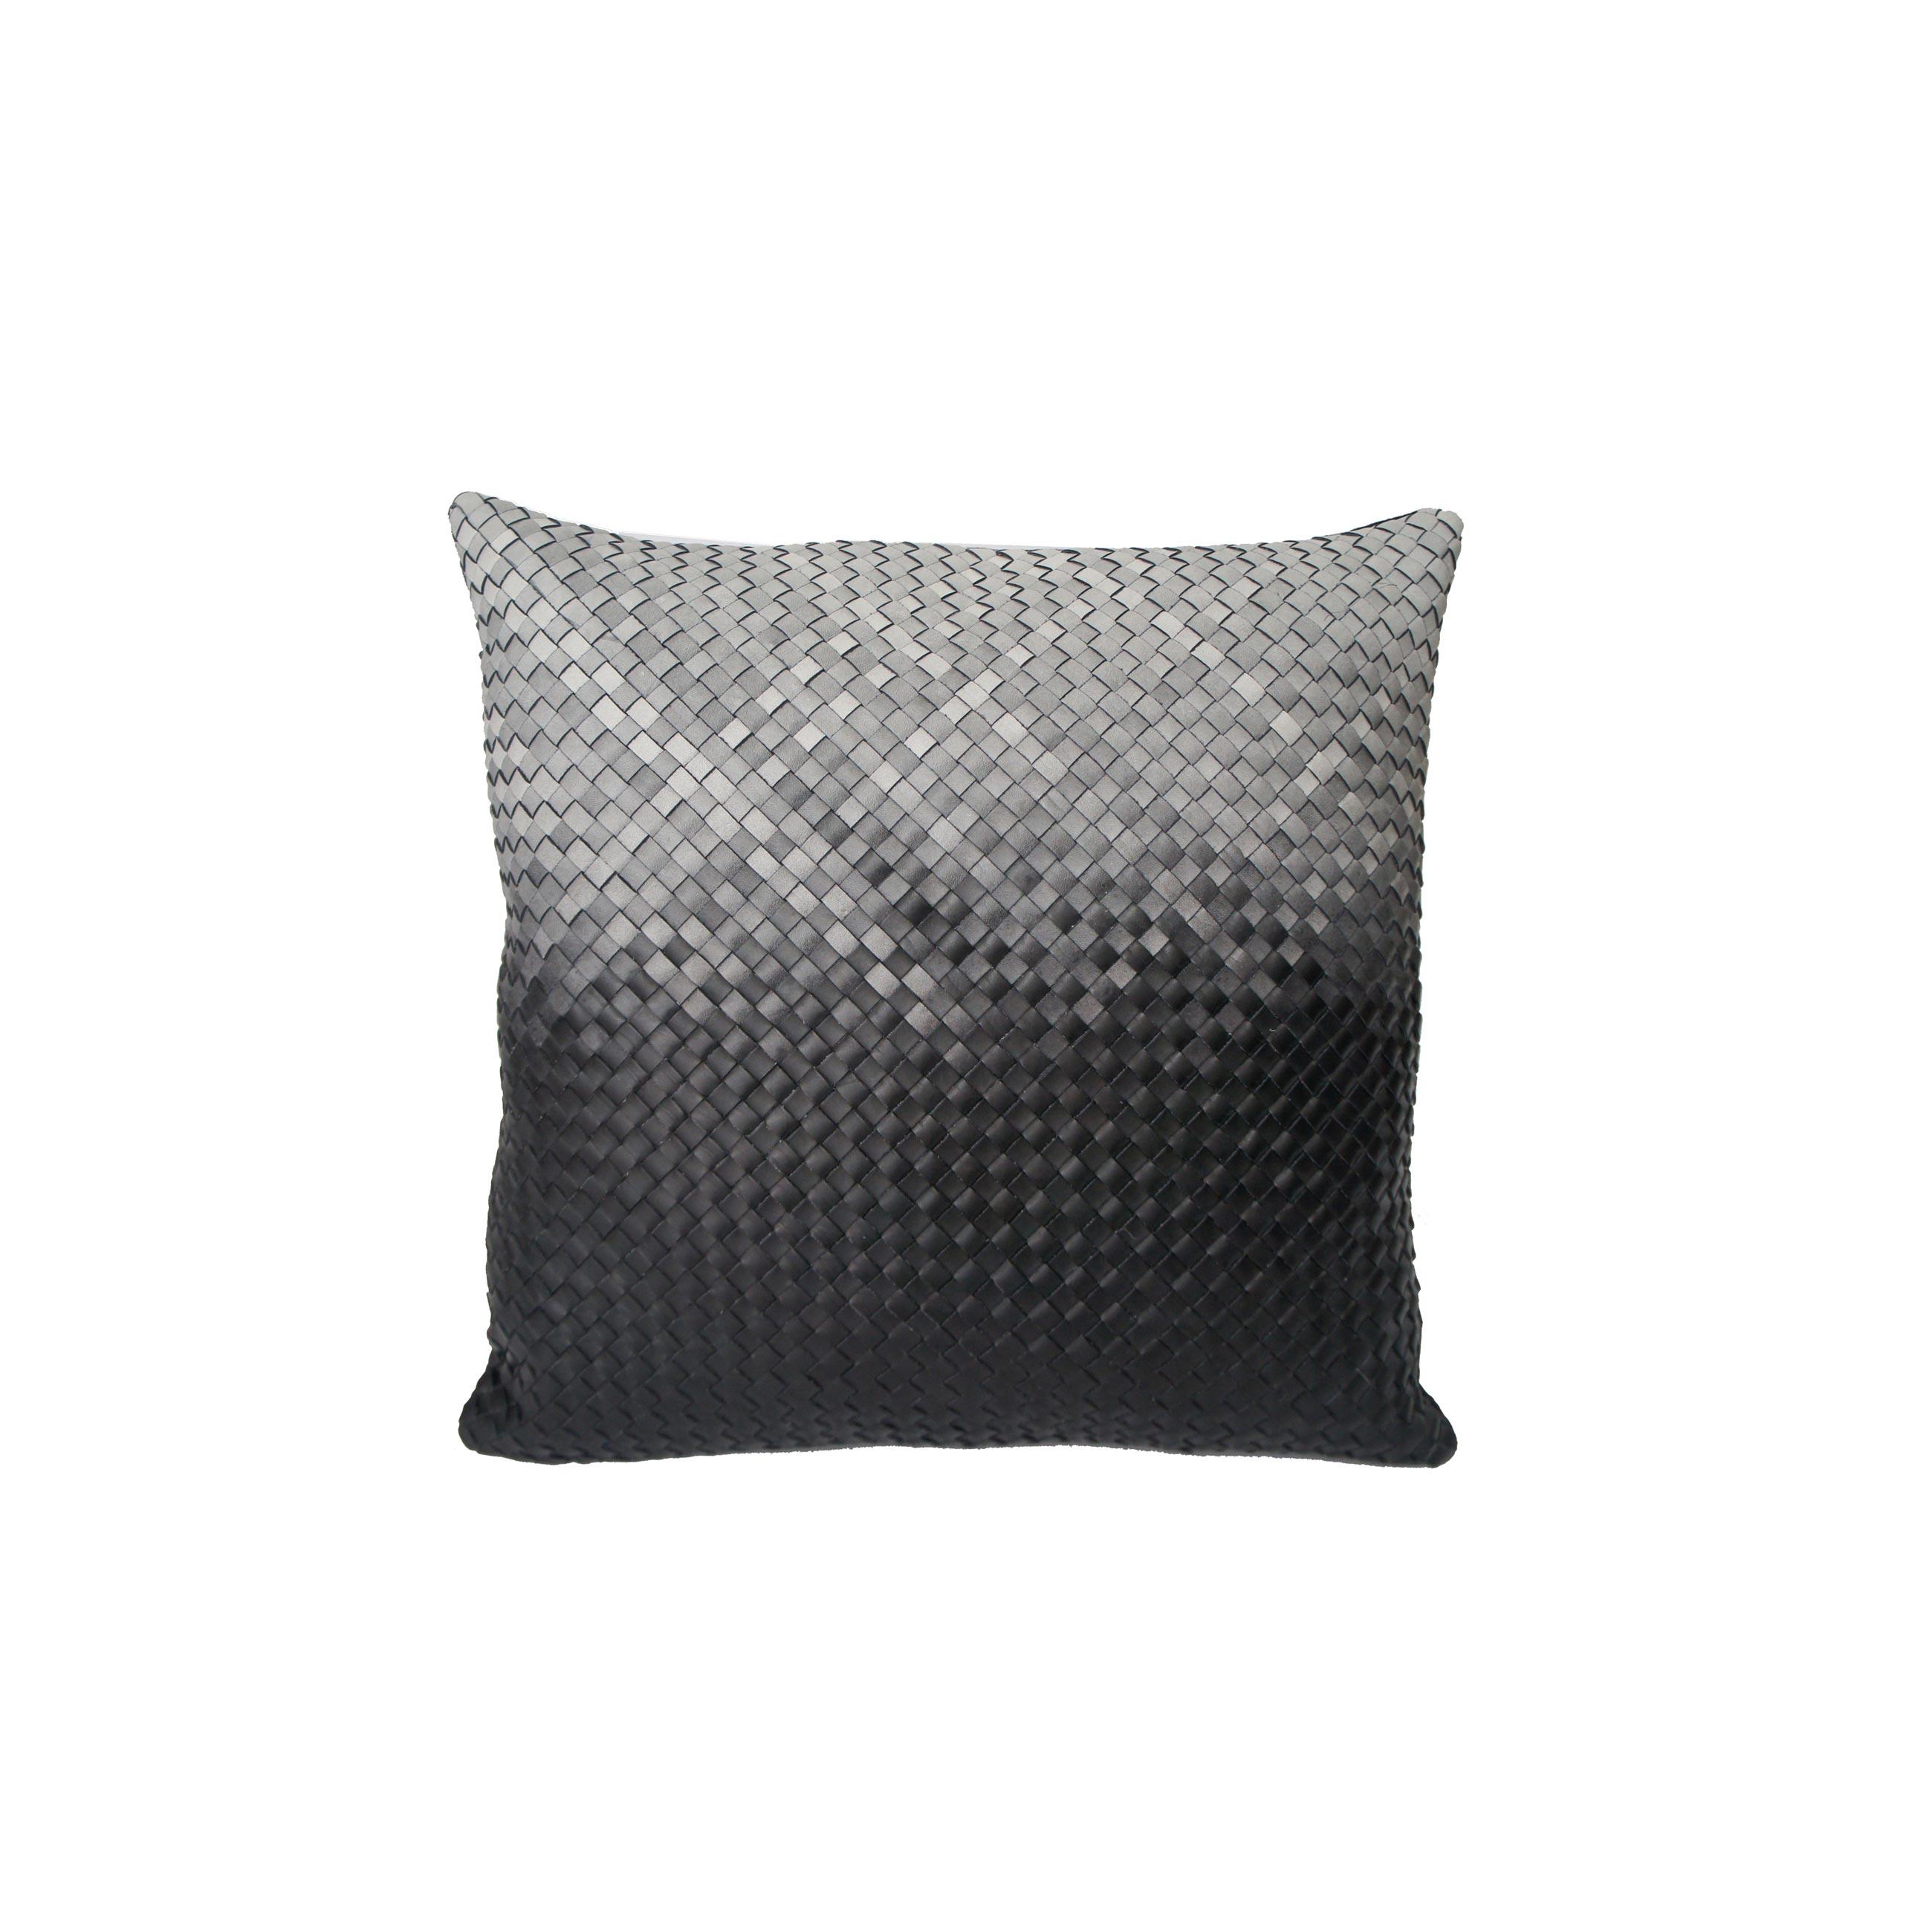 Mosaico Degrade Woven Leather Cushion Large